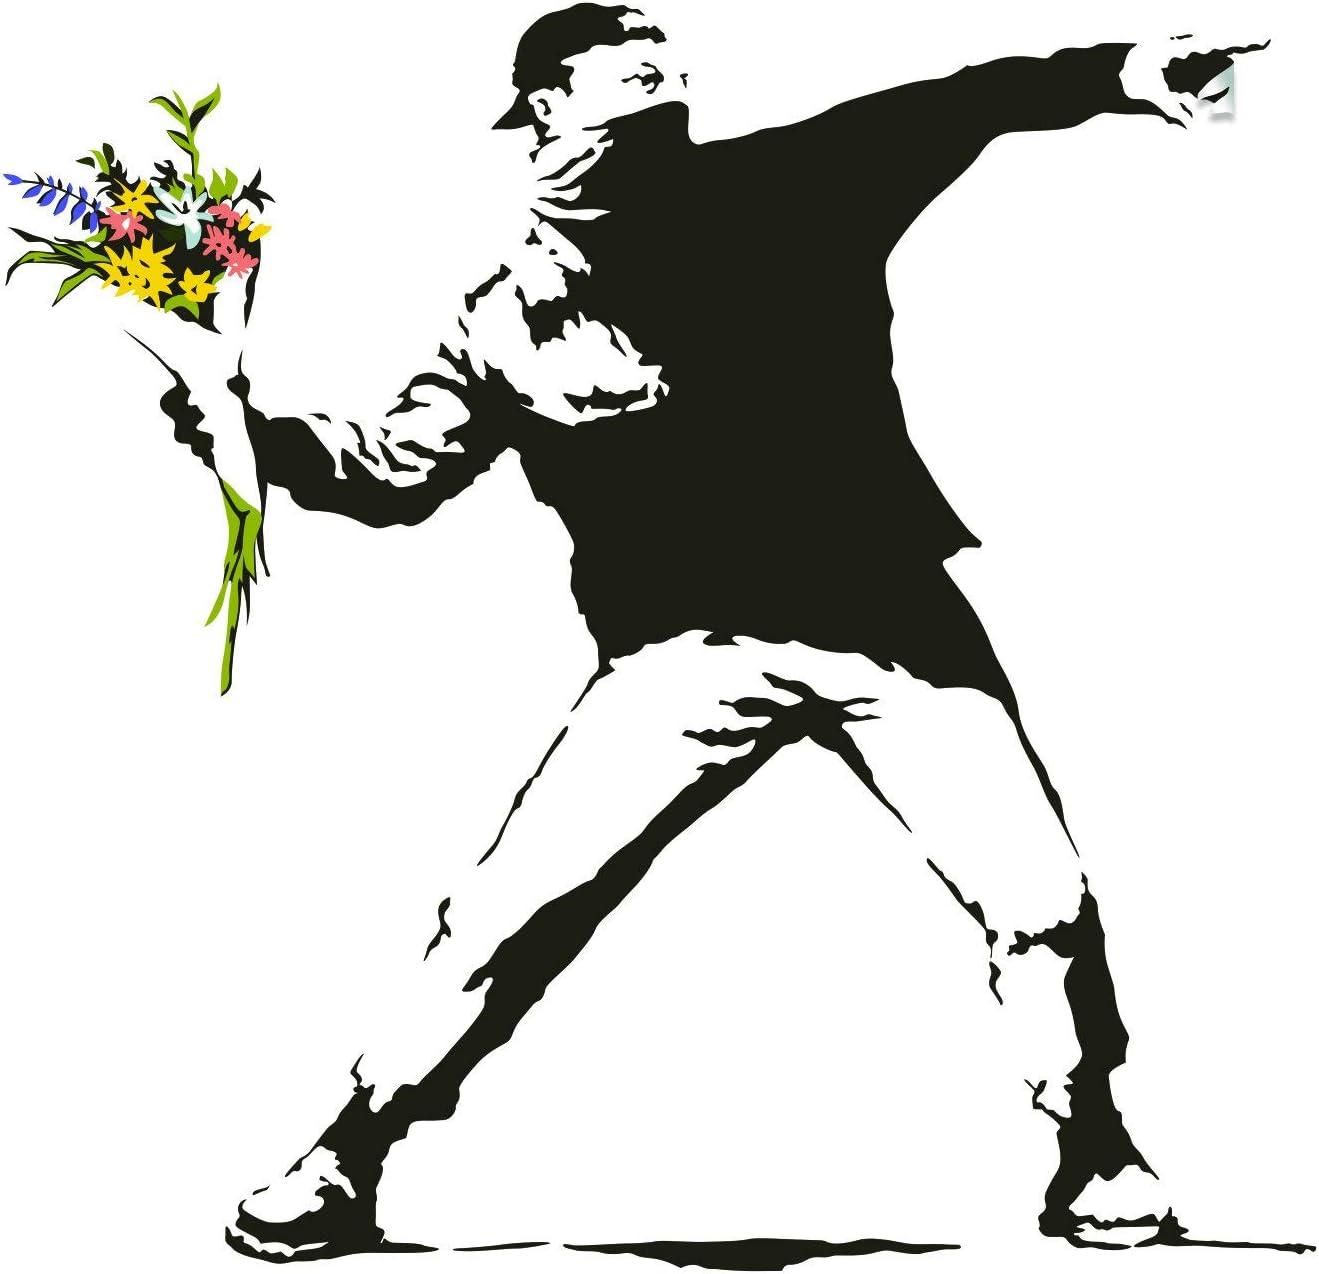 Finally popular brand Banksy Flower Throw Wall Vinyl Sticker free shipping Art Gift Decal - Thrower